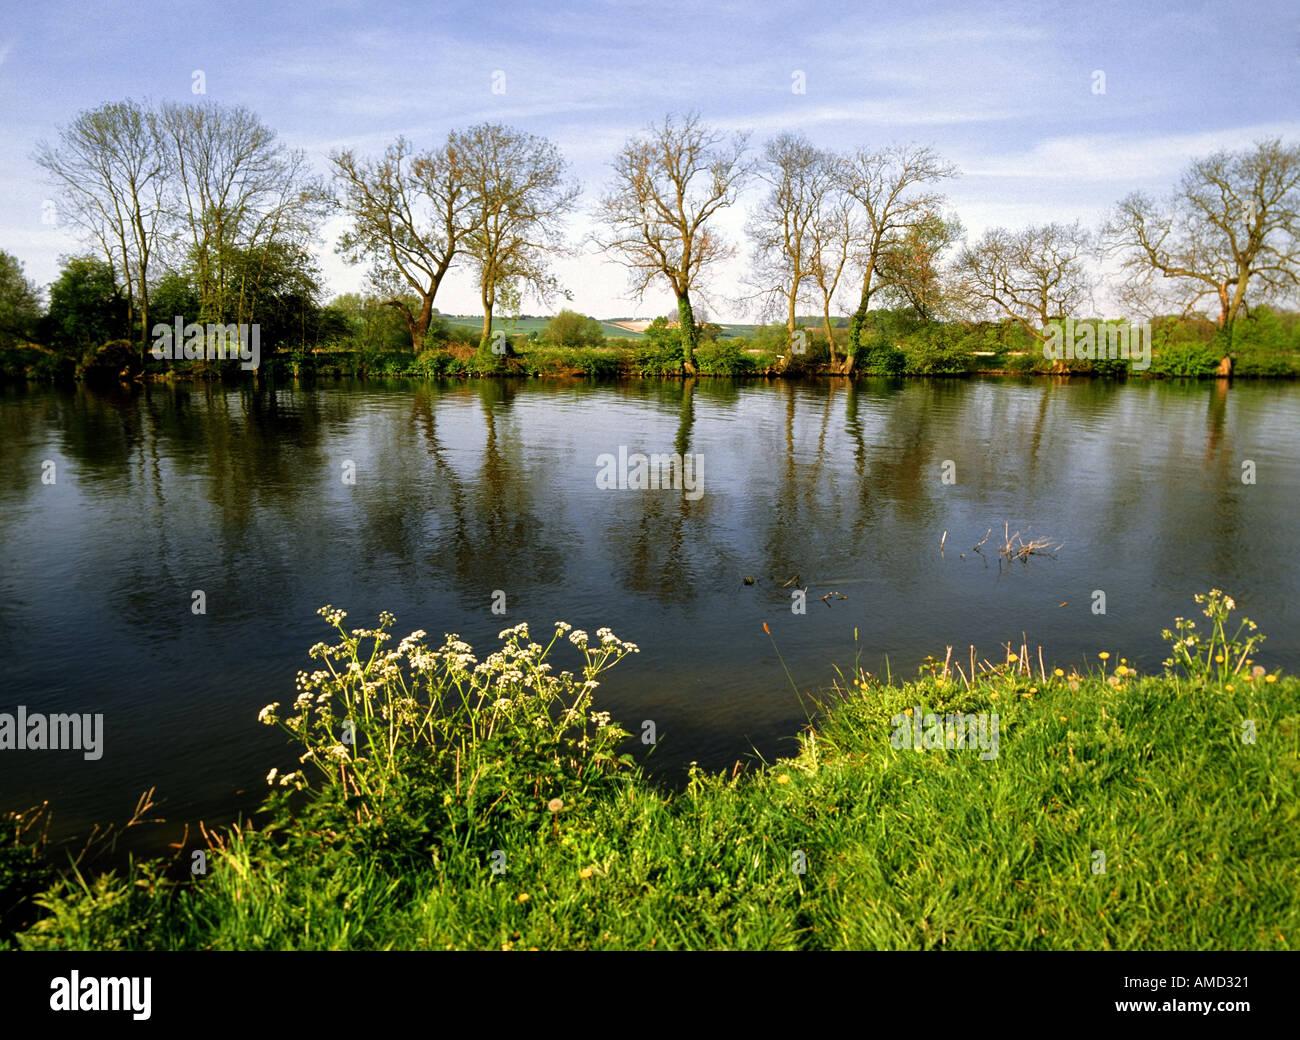 eu europe uk united kingdom great britain england river thames medmenham oxfordshire Stock Photo